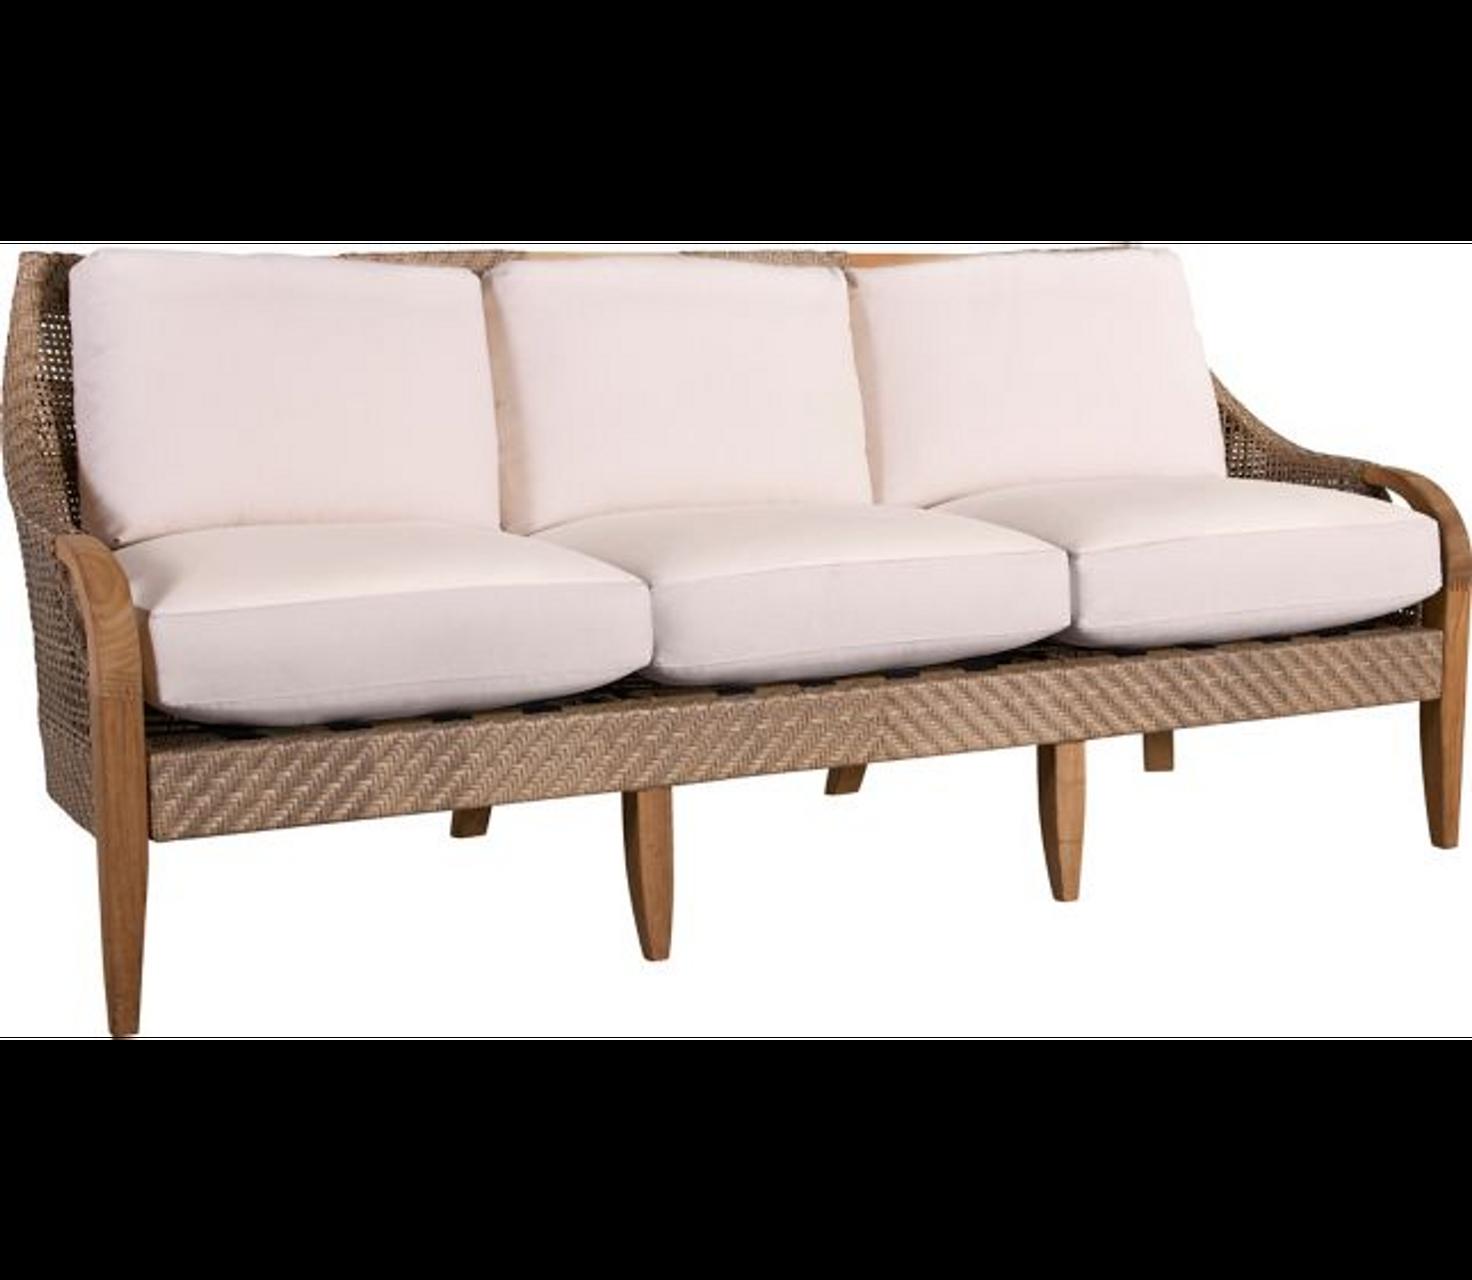 Lane Venture Edgewood Outdoor Teak and Synthetic Wicker Sofa - Trees ...